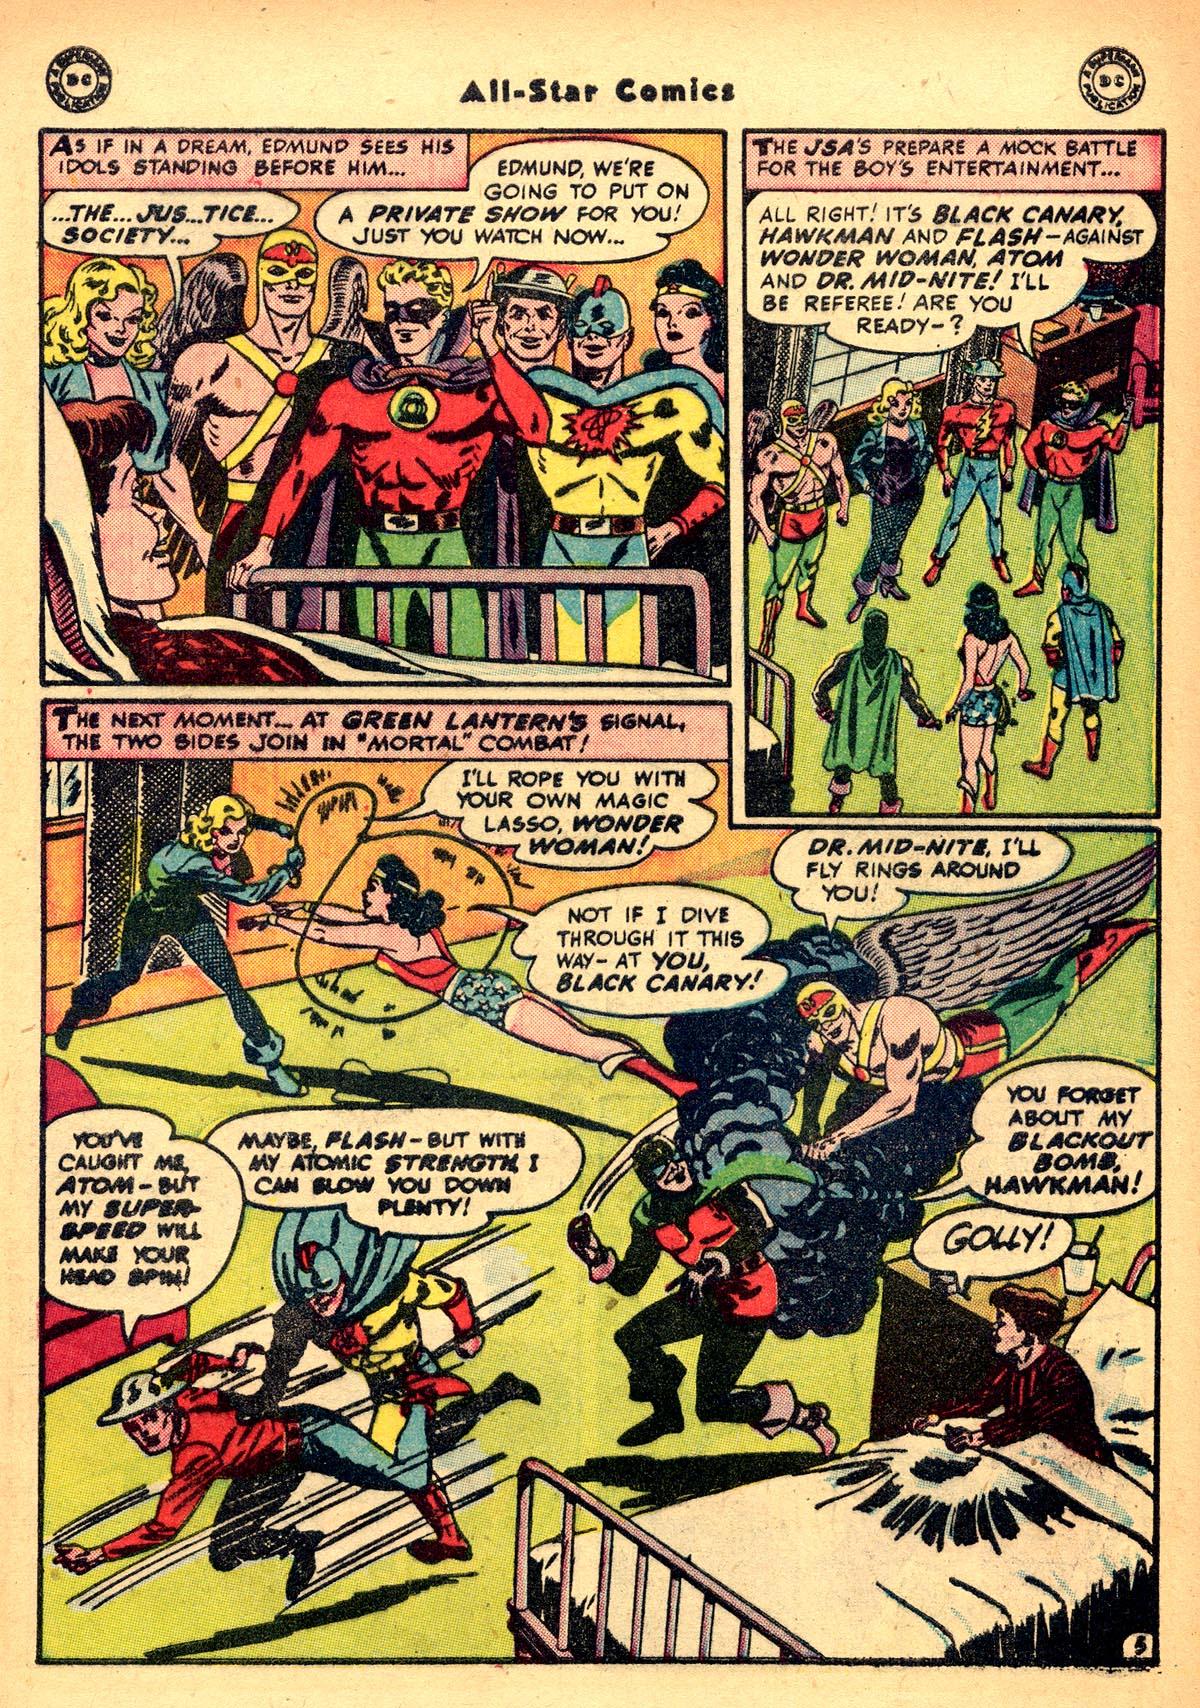 Read online All-Star Comics comic -  Issue #48 - 7